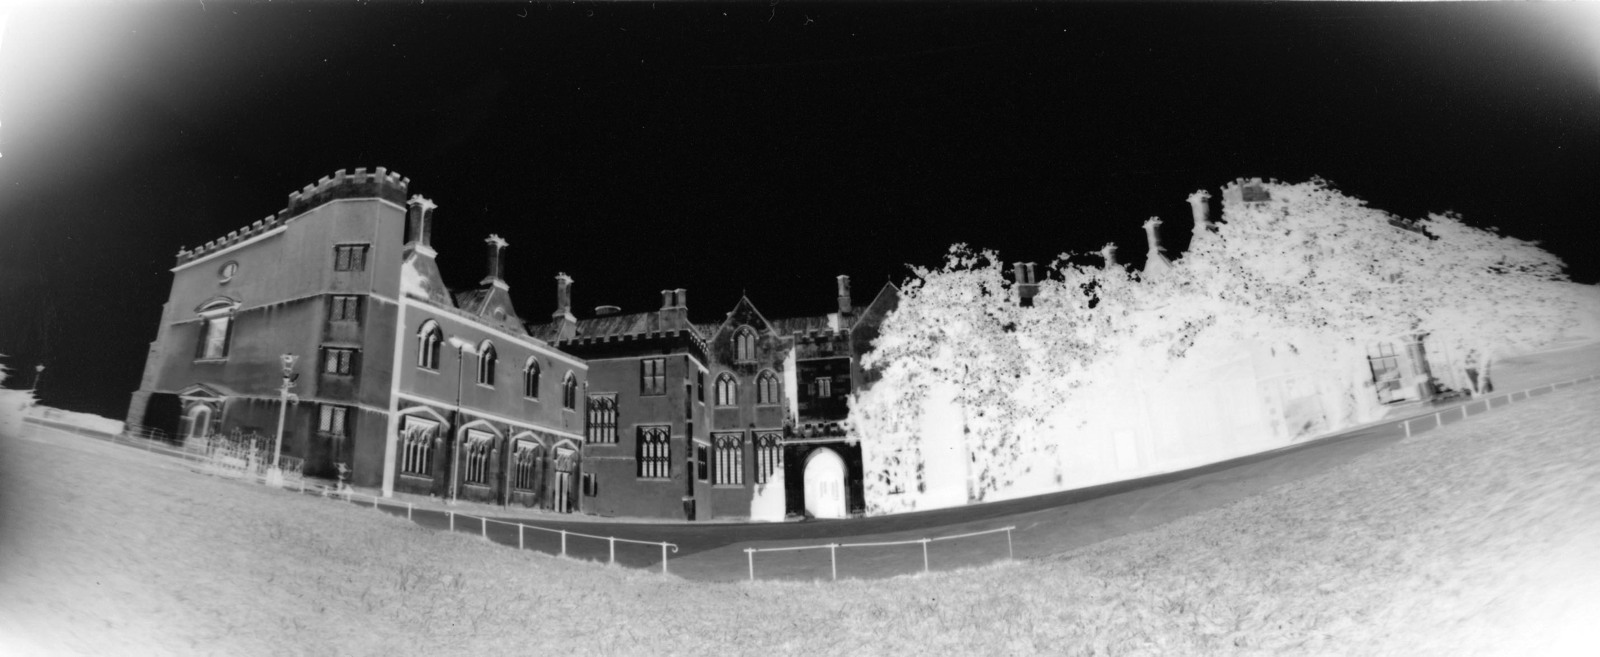 13. Ashton Court Mansion